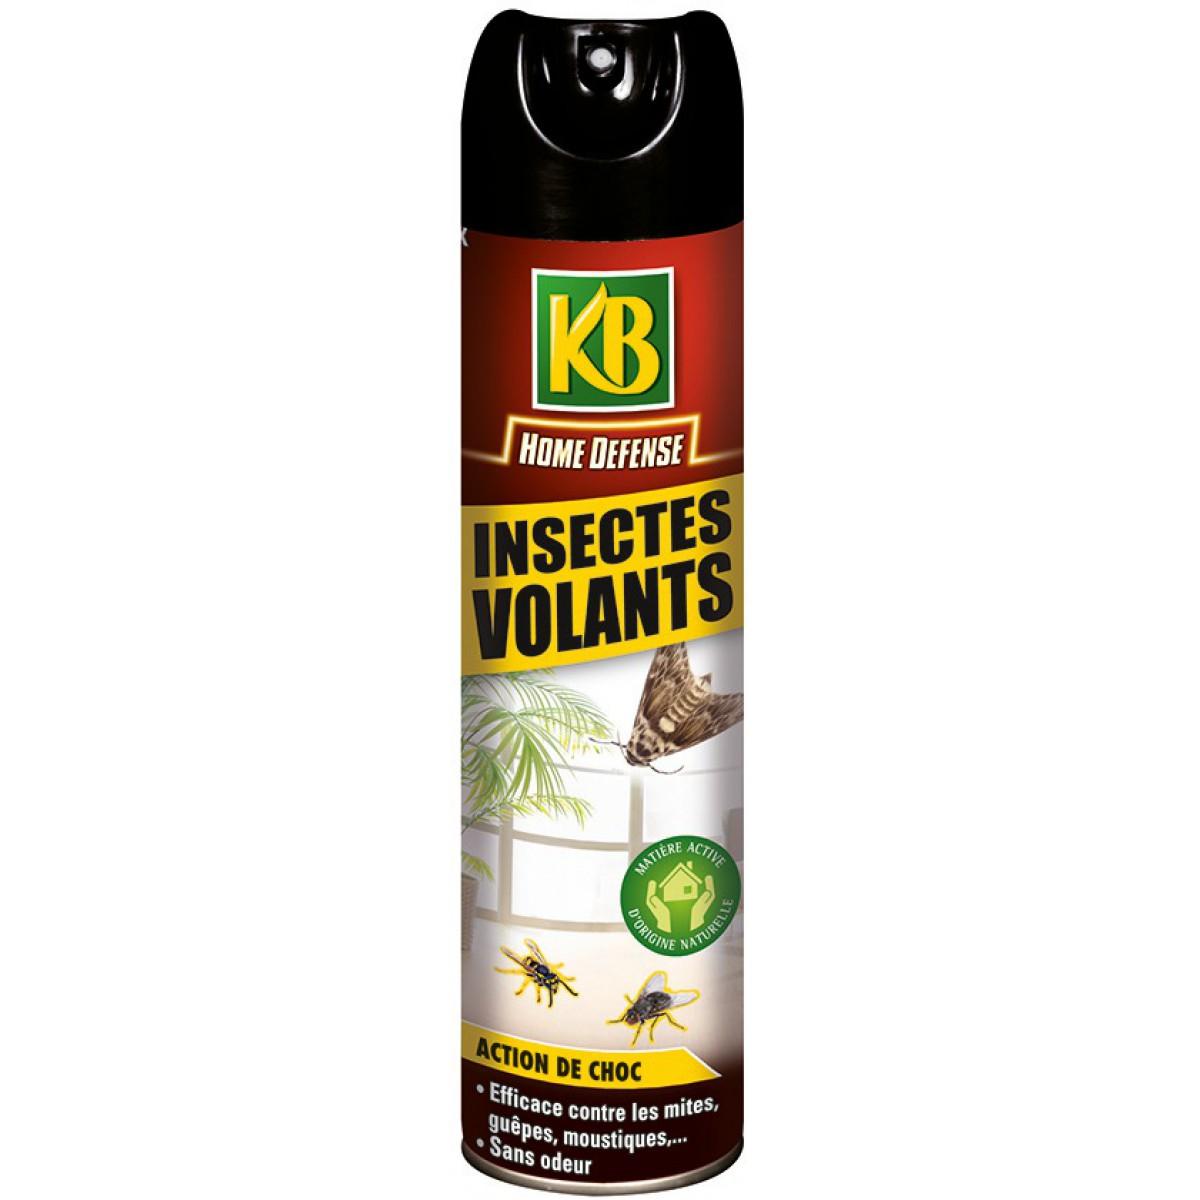 Insecte Salle De Bain Volant ~ insecticide insectes volants kb home defense a rosol 400 ml de